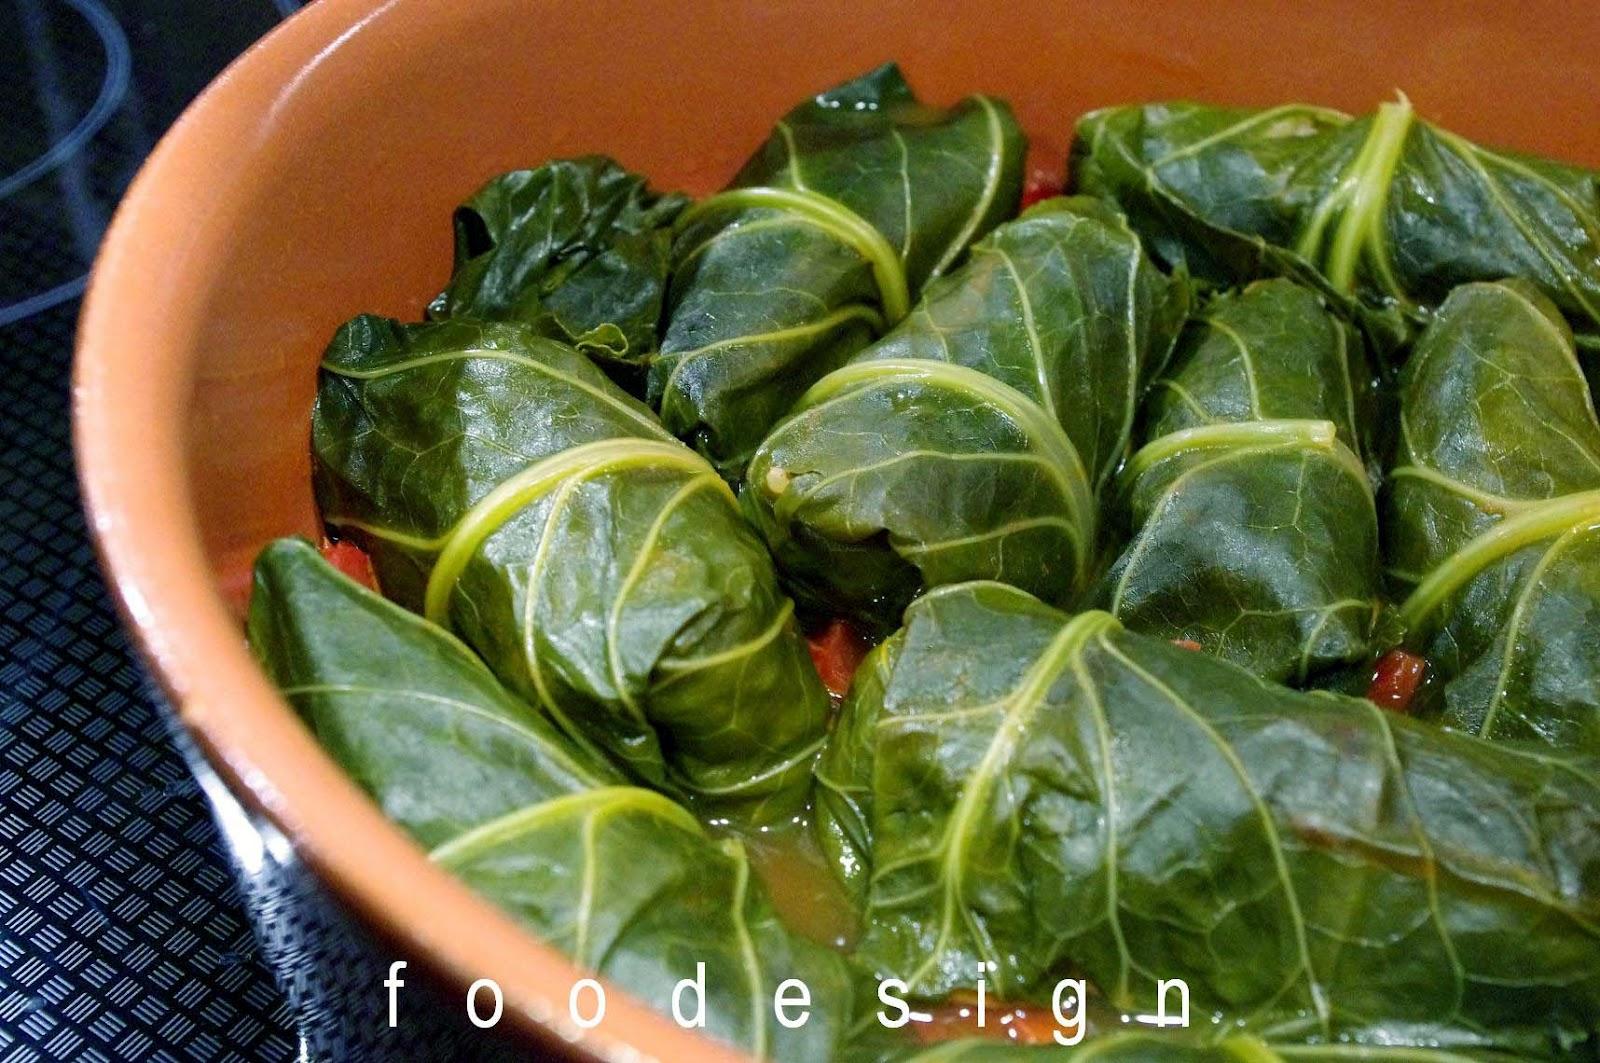 foodesign: collard greens rolls